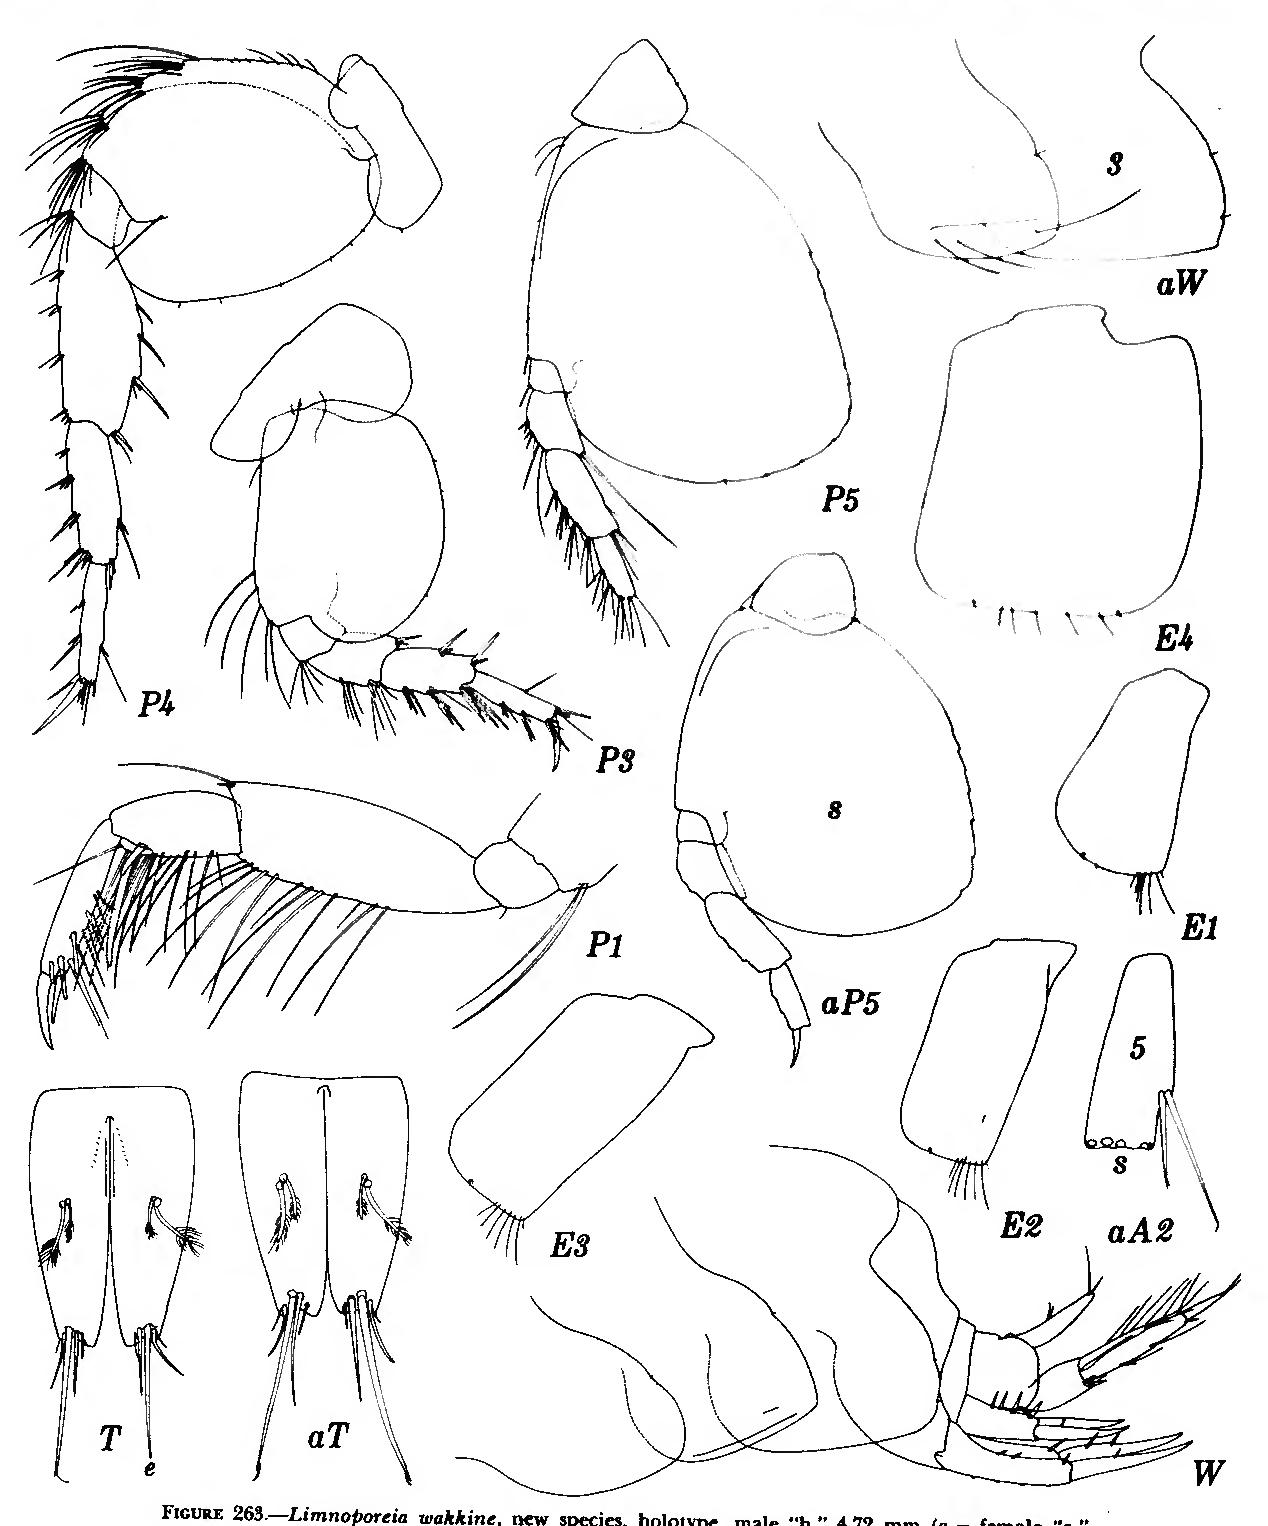 figure 263